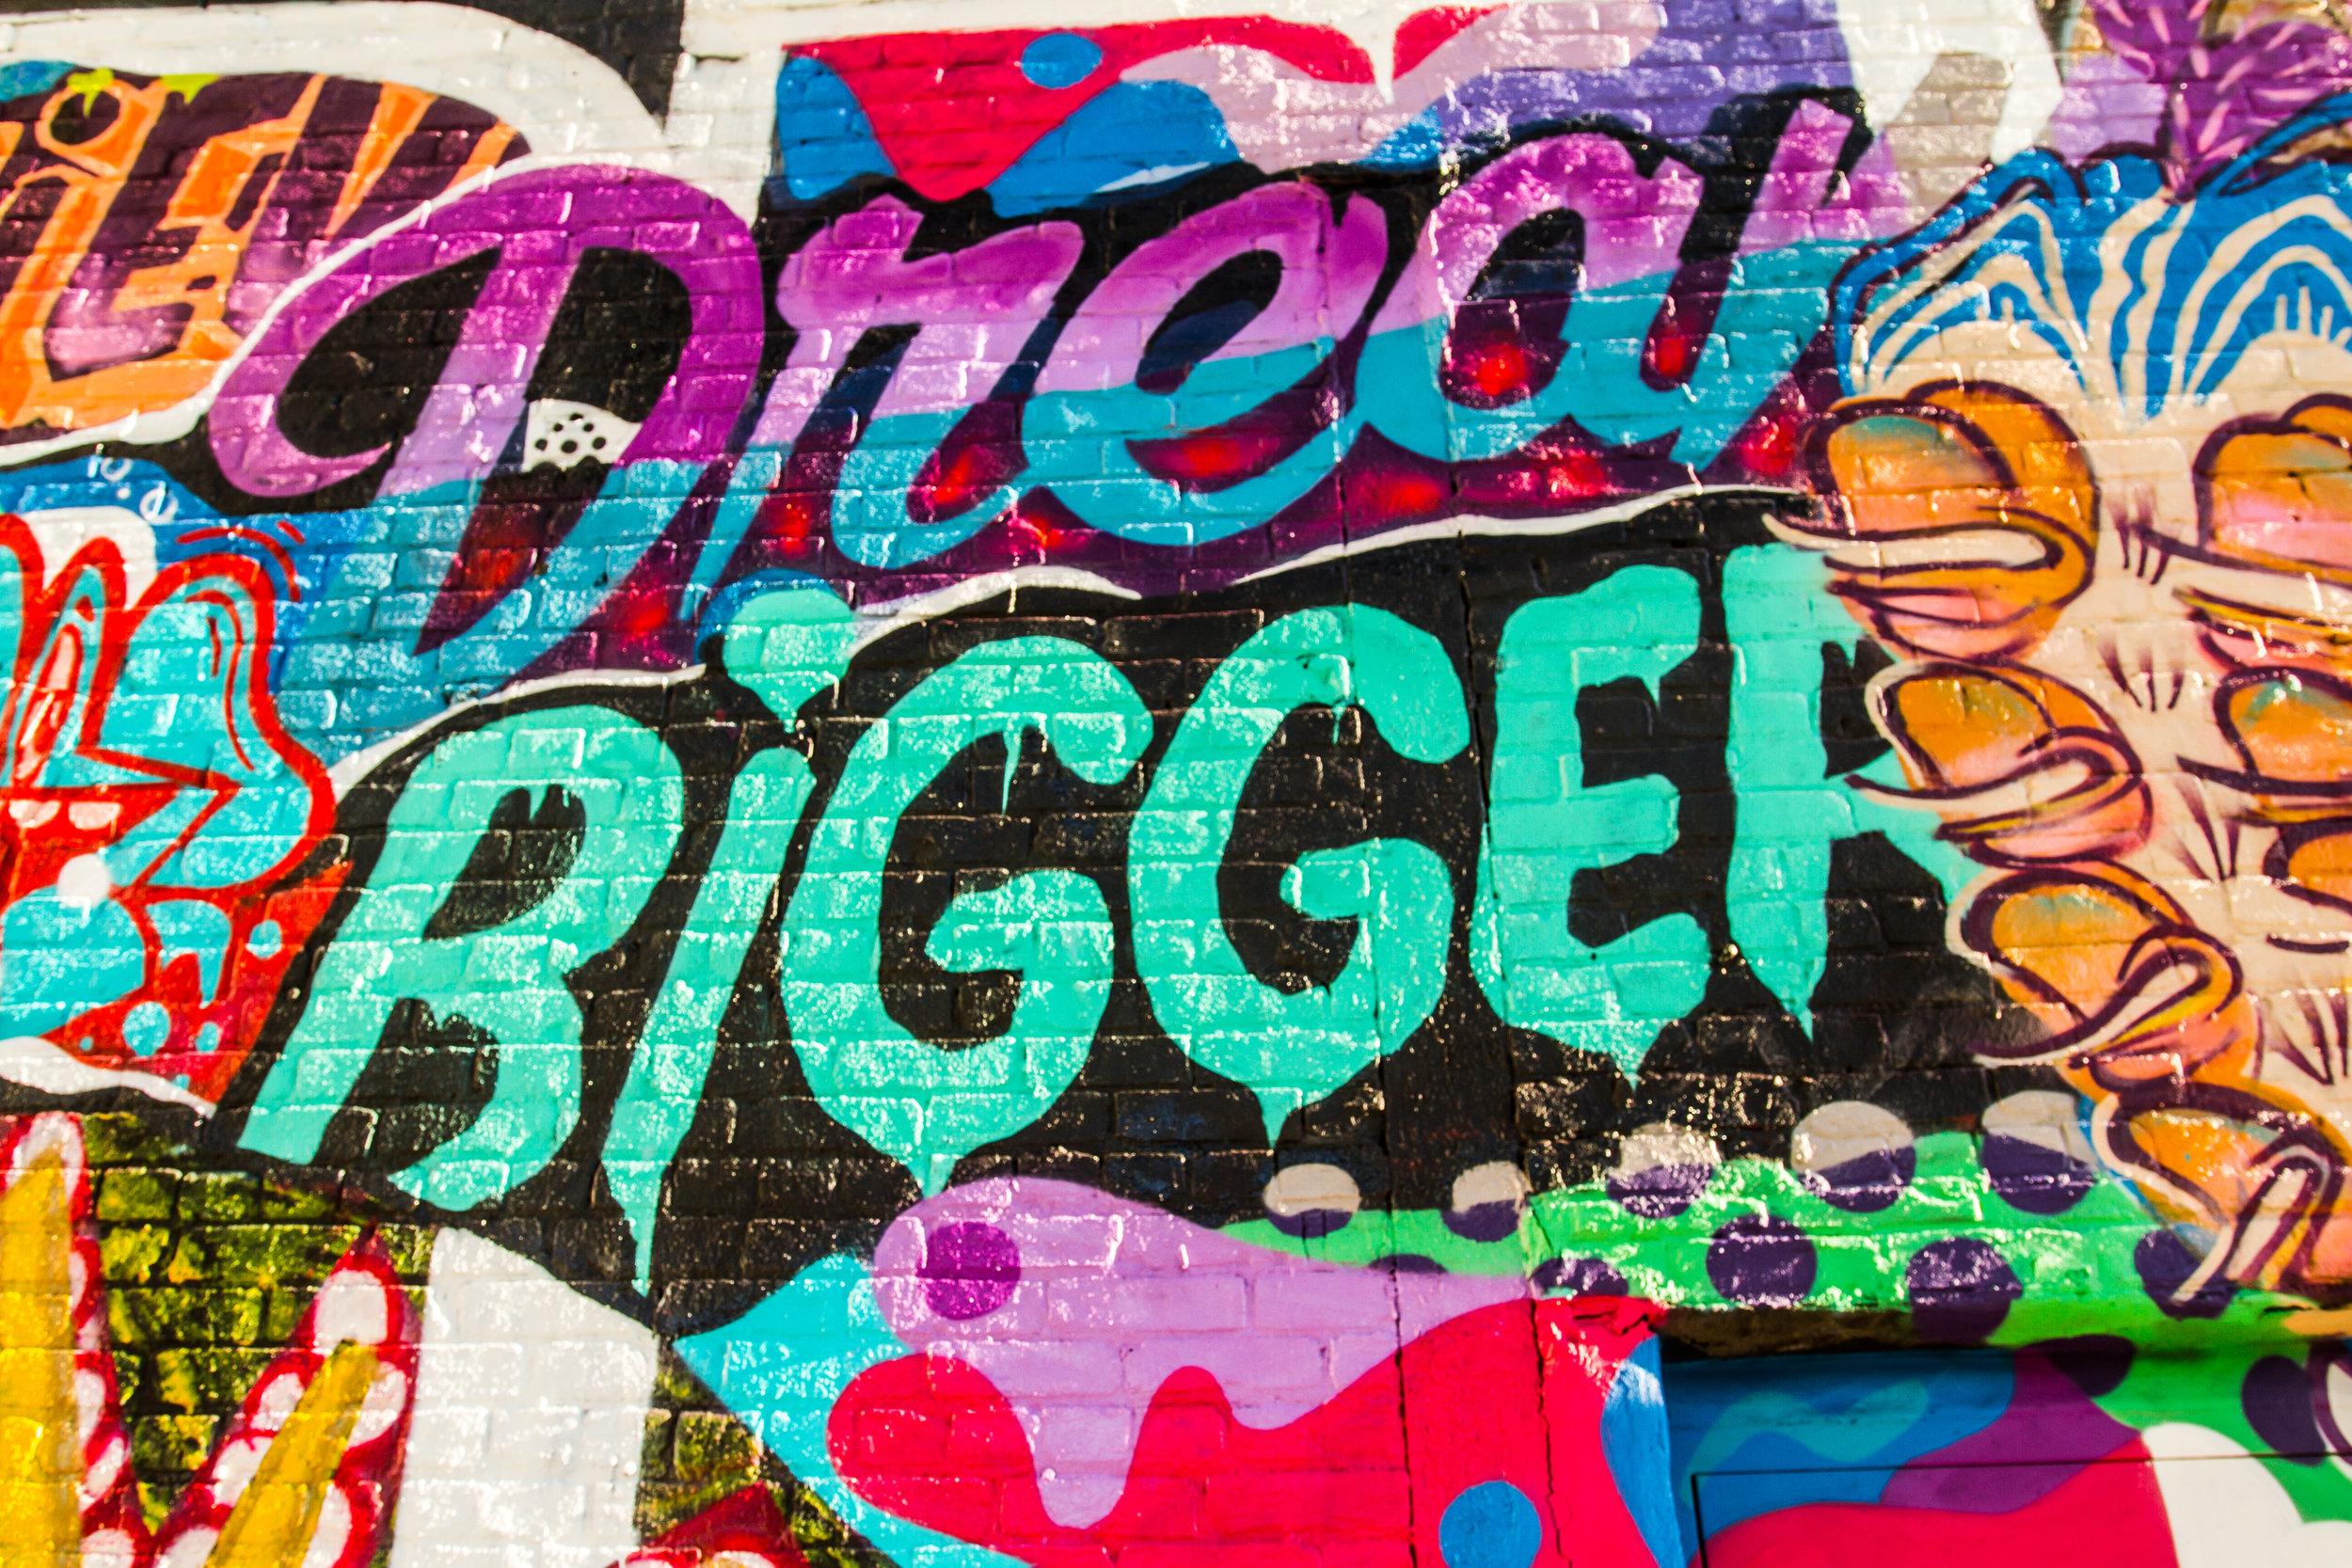 Street Art in Gowanus. Photo by JW Photography.